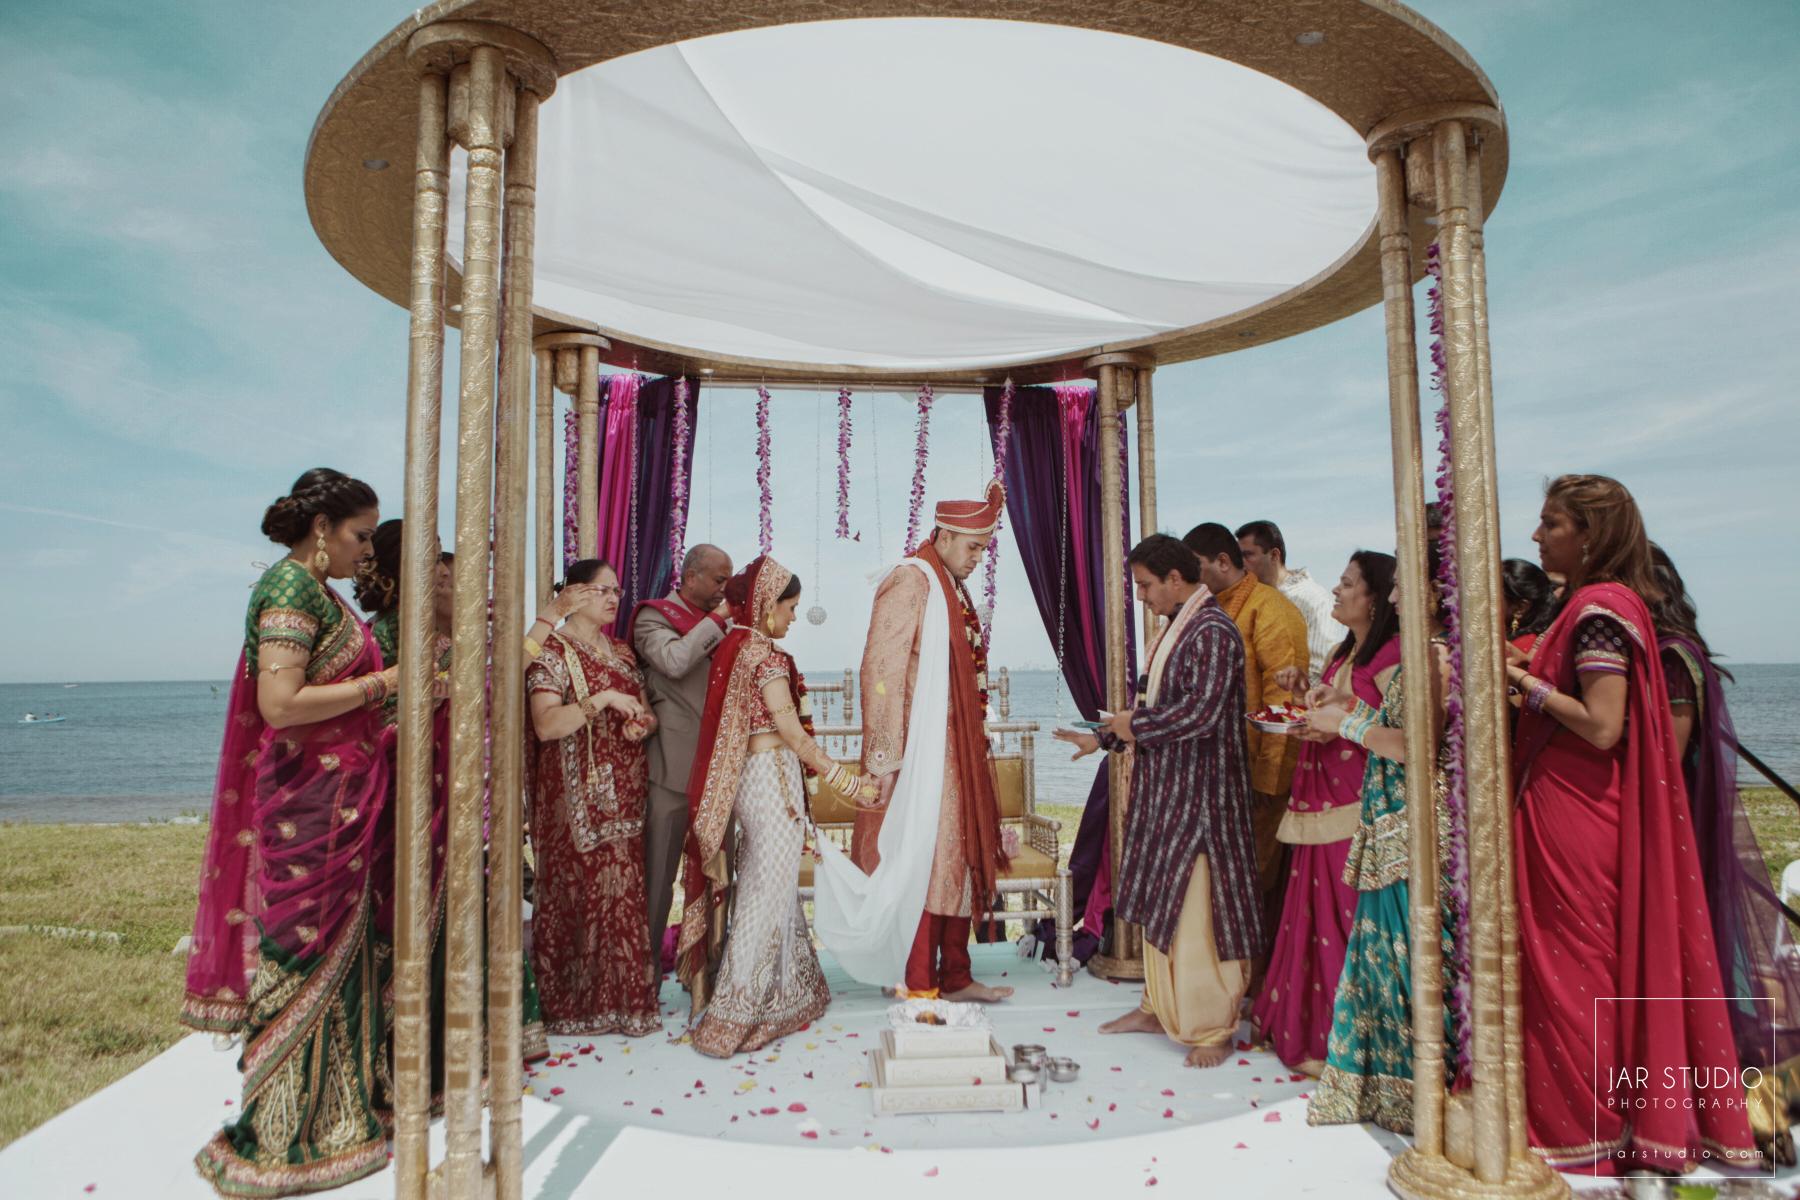 43-orlando-fl-hindu-indian-wedding-photographer-jarstudio.JPG